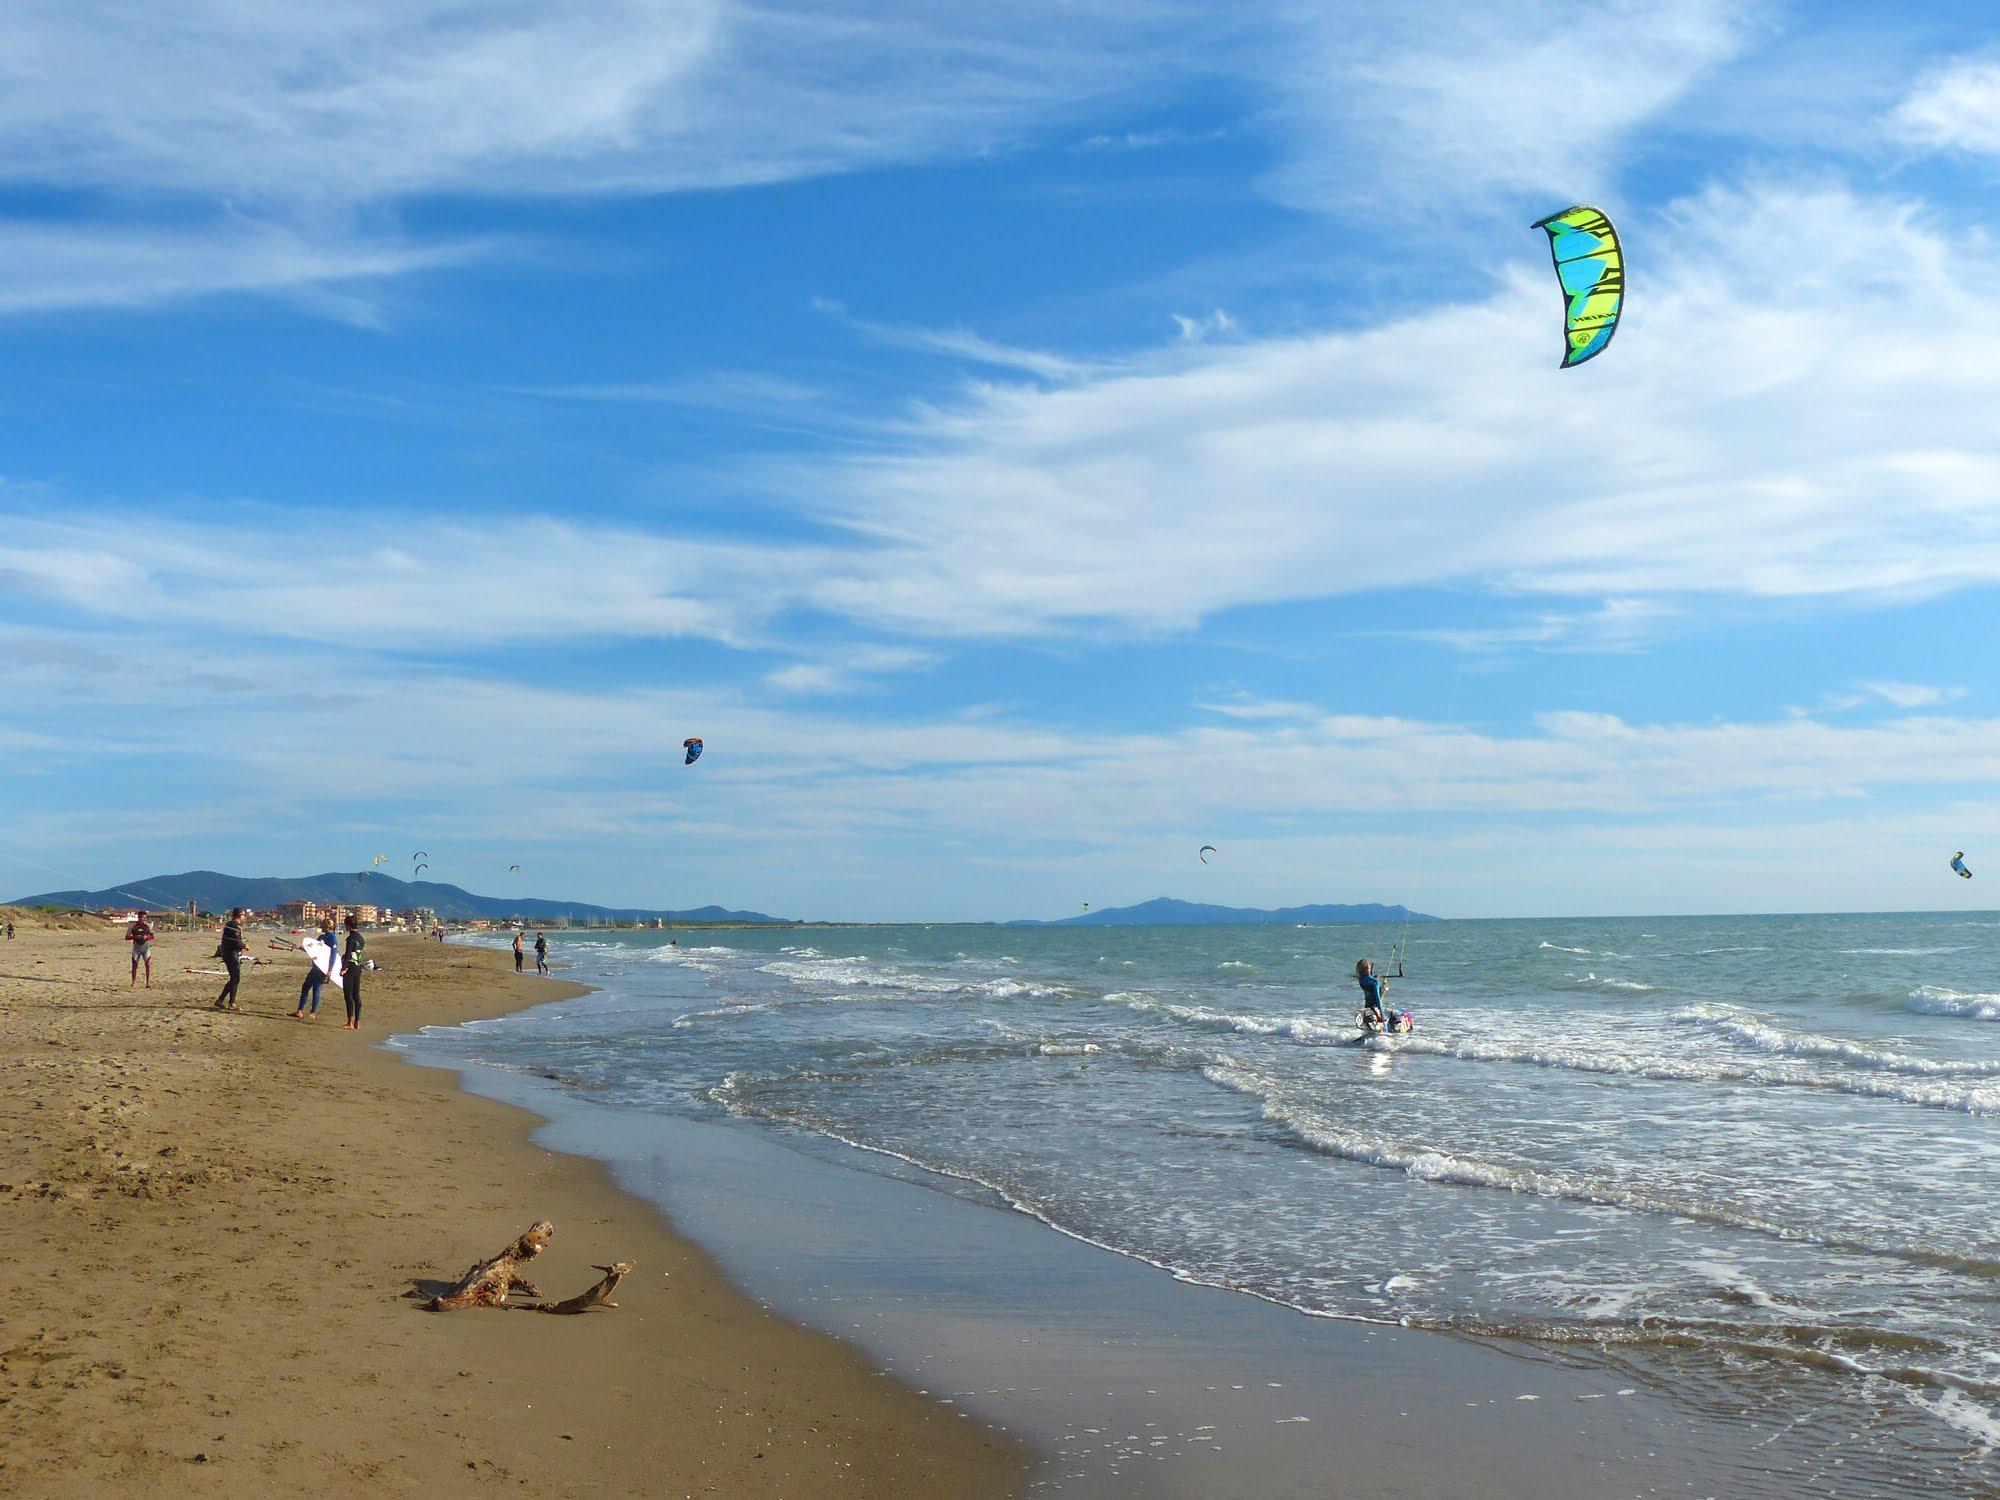 Spiaggia Fiumara Beach - Kite Spot